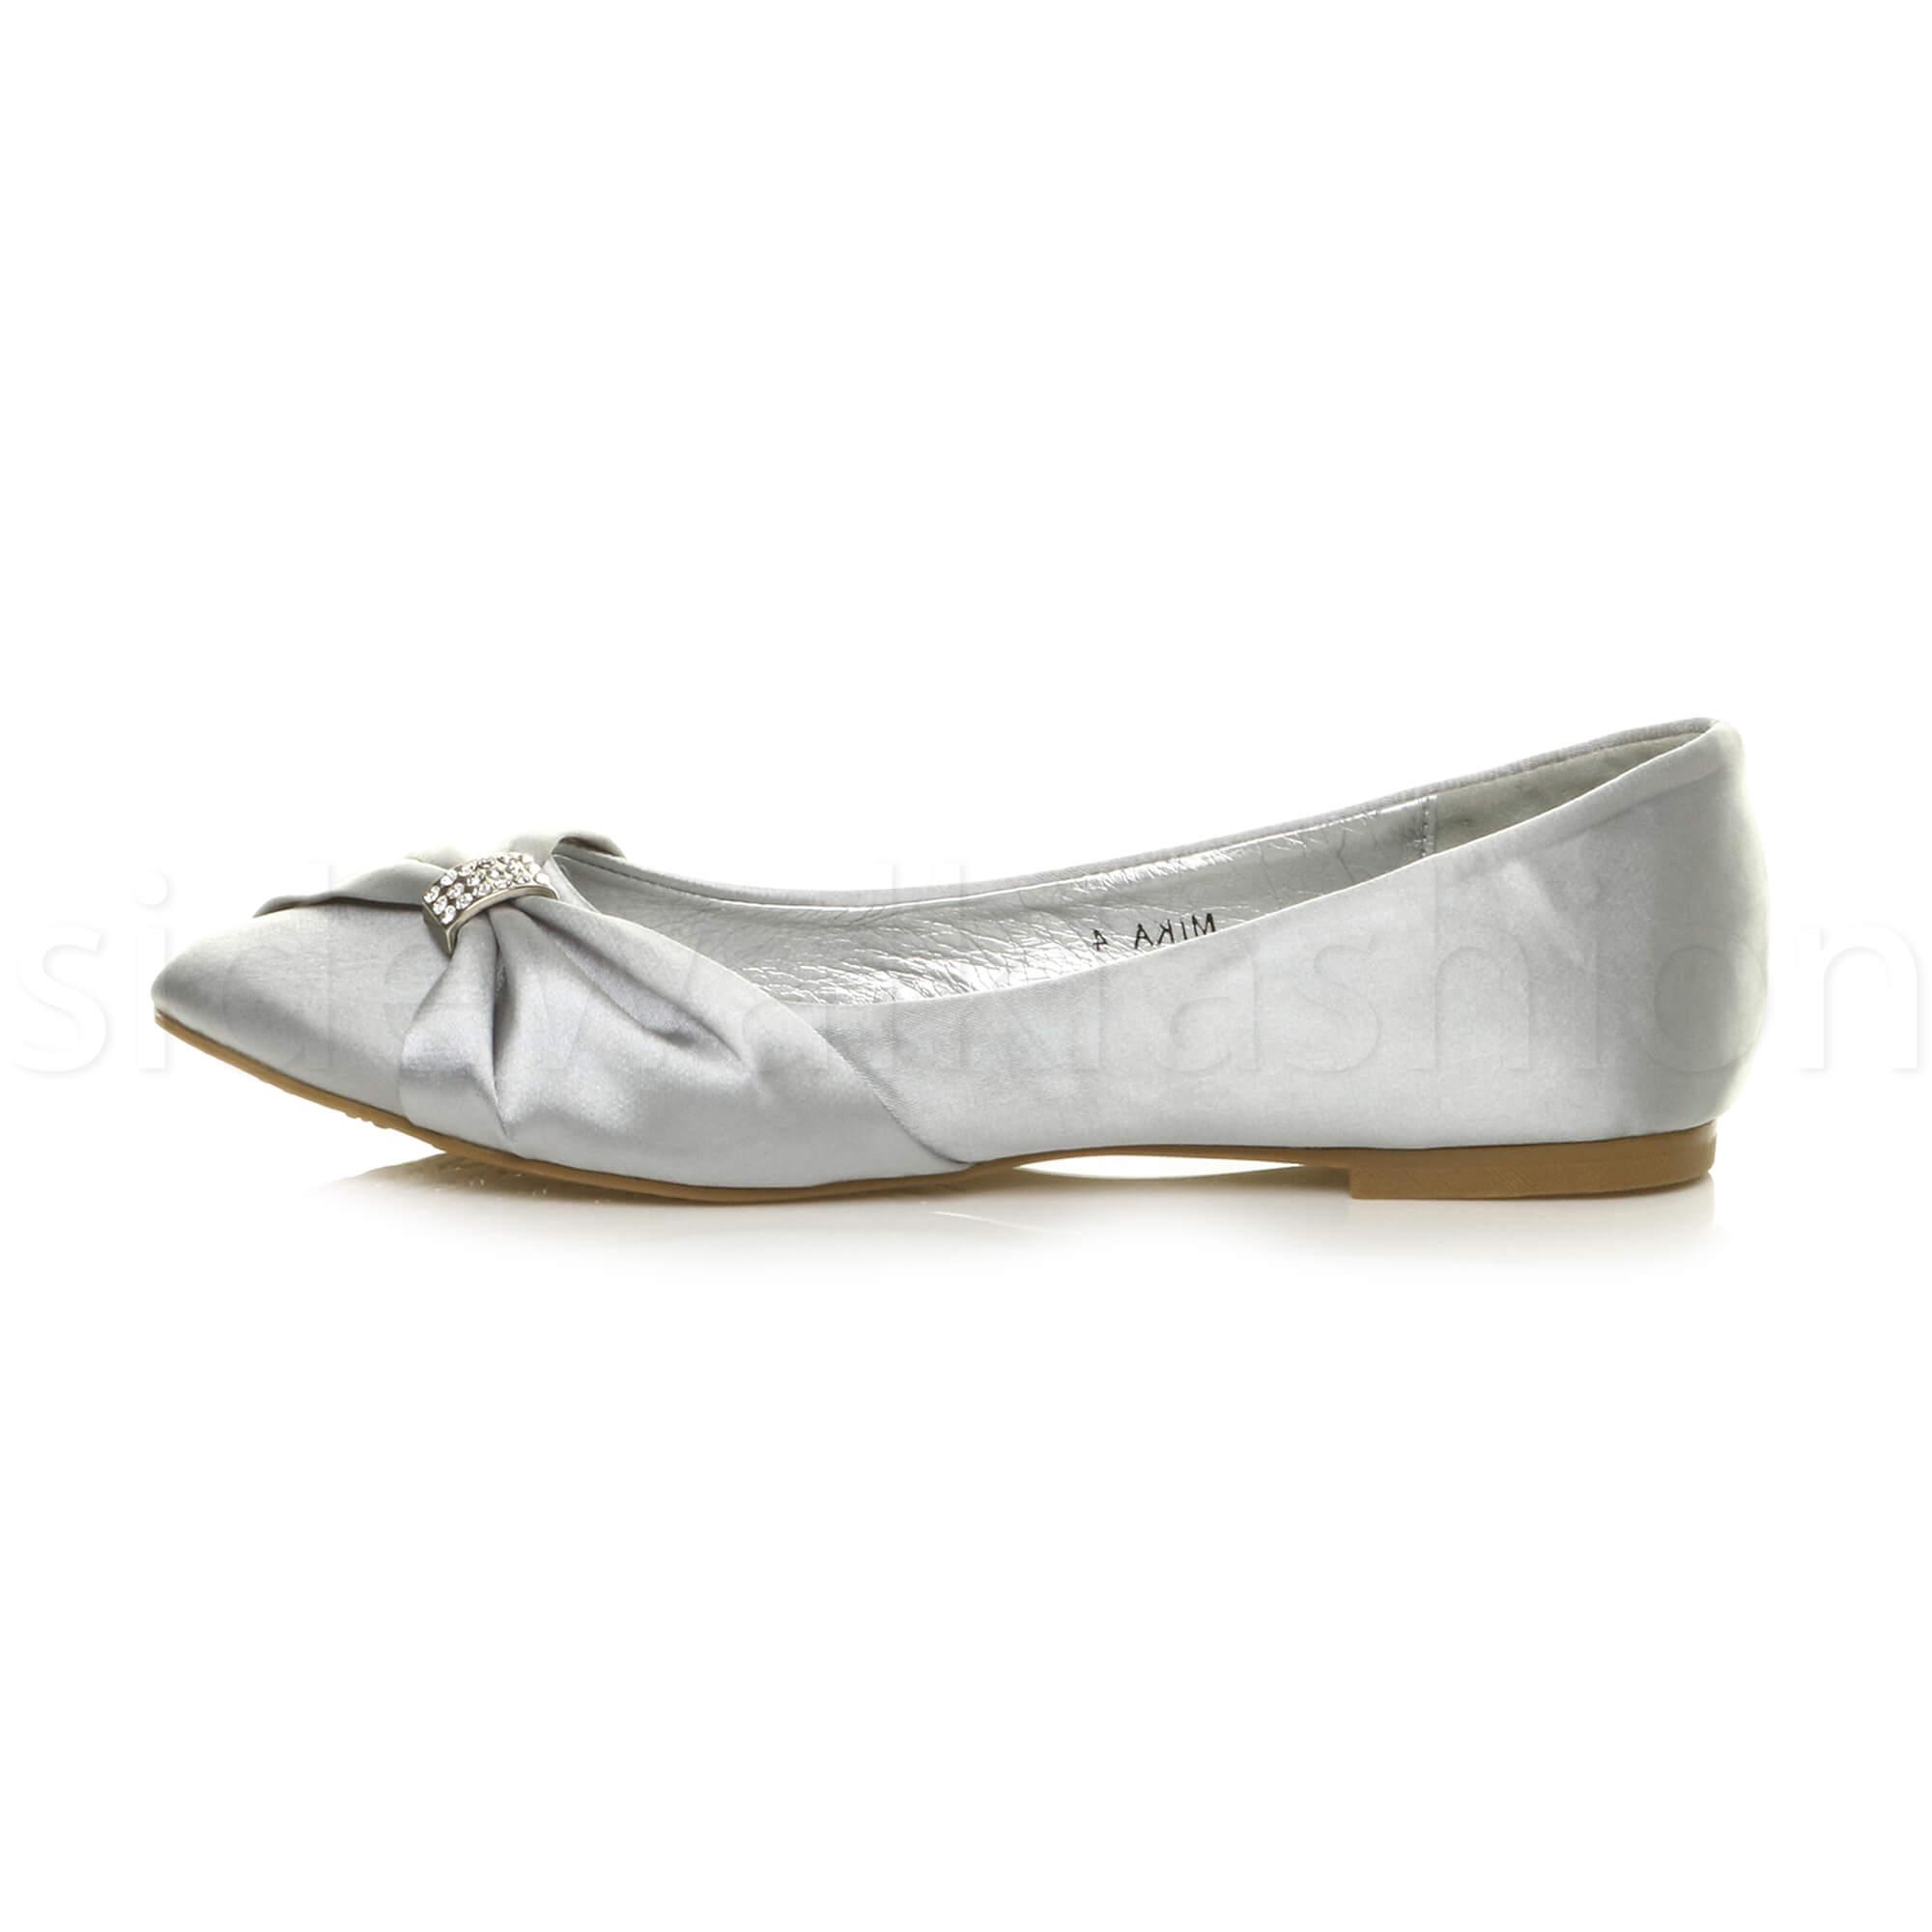 Womens-ladies-flat-wedding-bridesmaid-ruched-diamante-bridal-shoes-pumps-size thumbnail 27